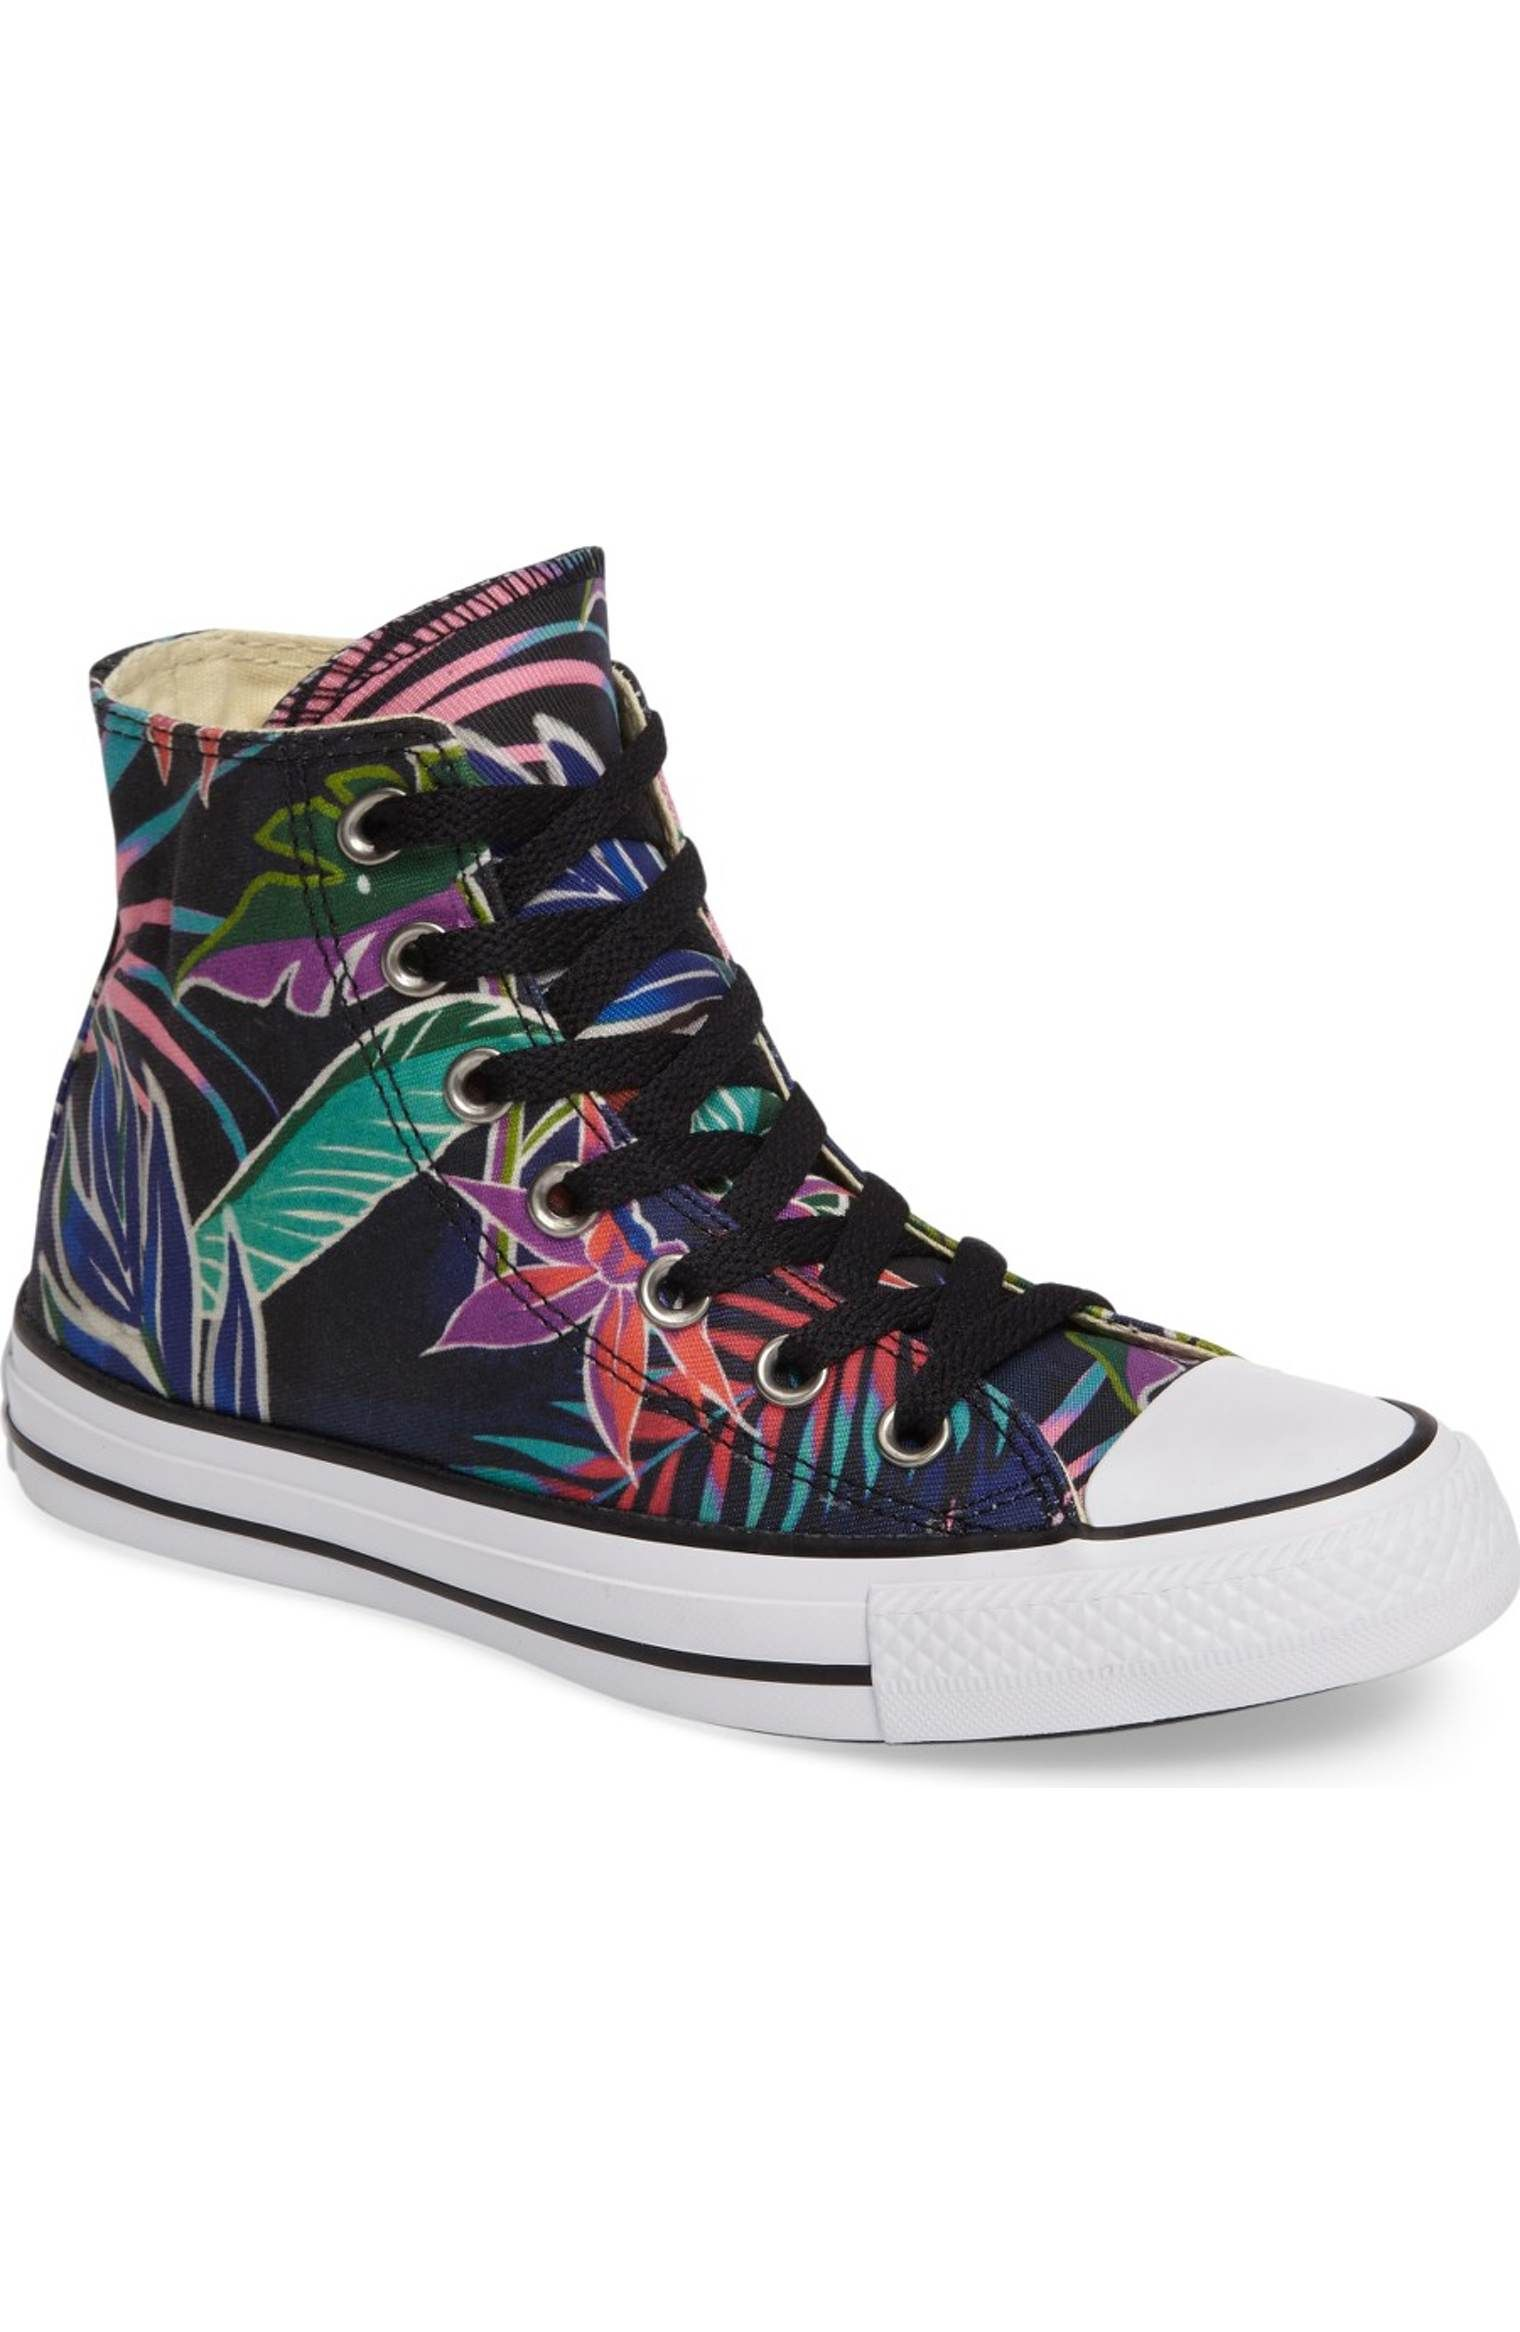 brand new 730b1 128fa Main Image - Converse Chuck Taylor® All Star® Print High Top Sneaker (Women)